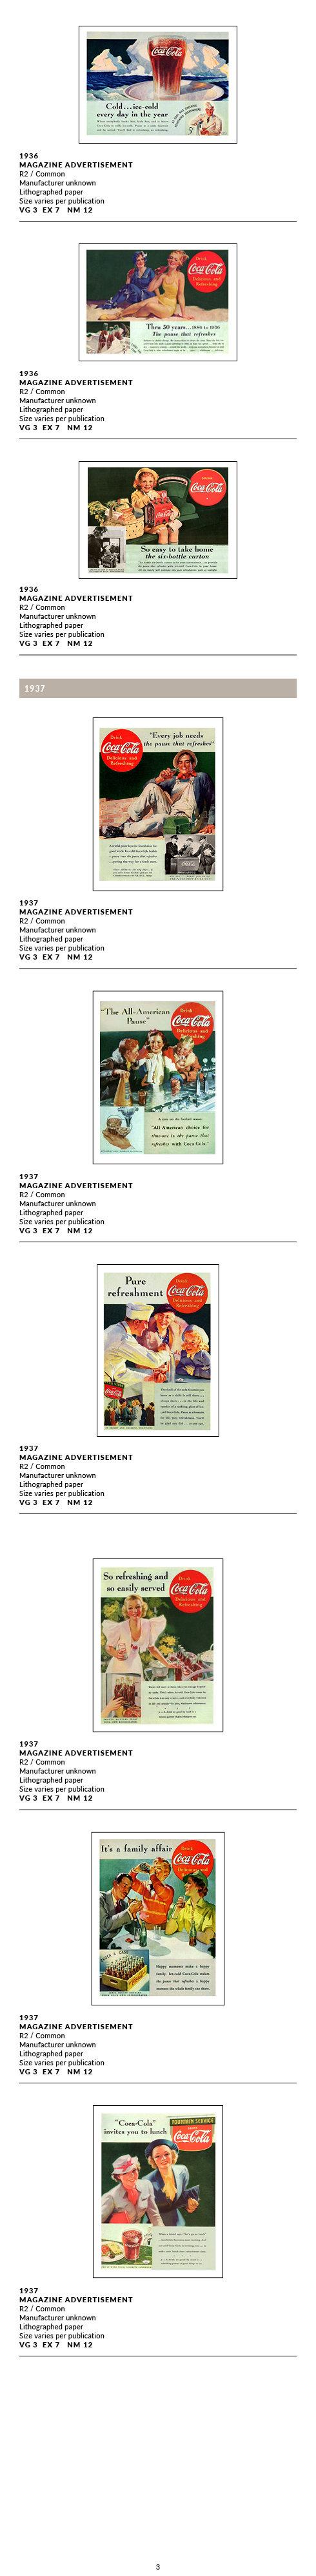 1935-39 Ads3.jpg